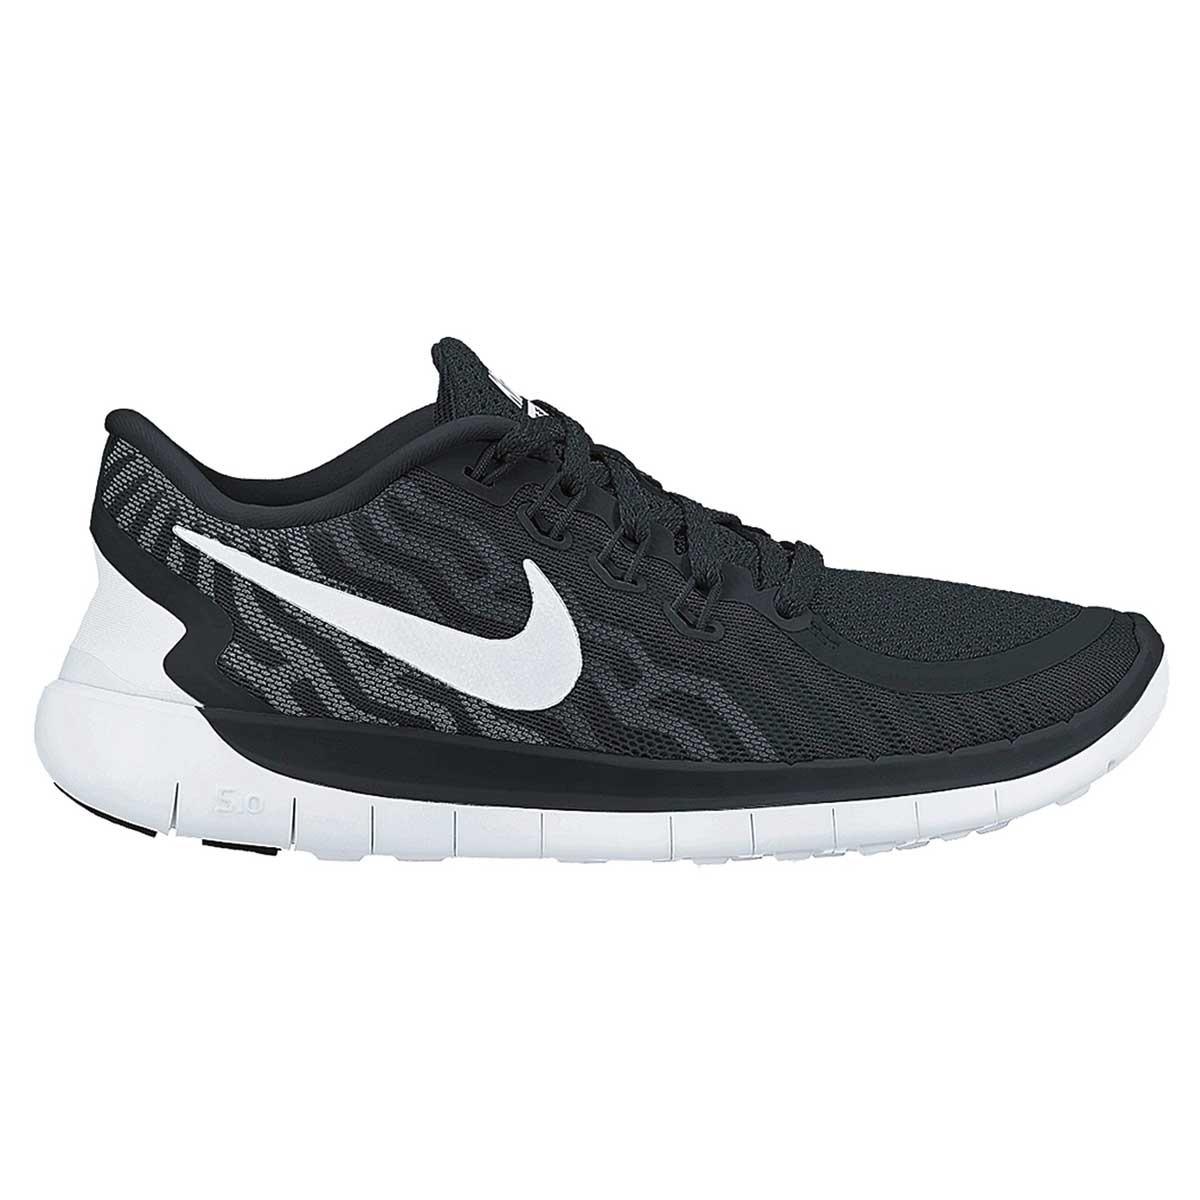 2fee9c0f6f2b Nike Free Run 5.0 Men s - Lazybee